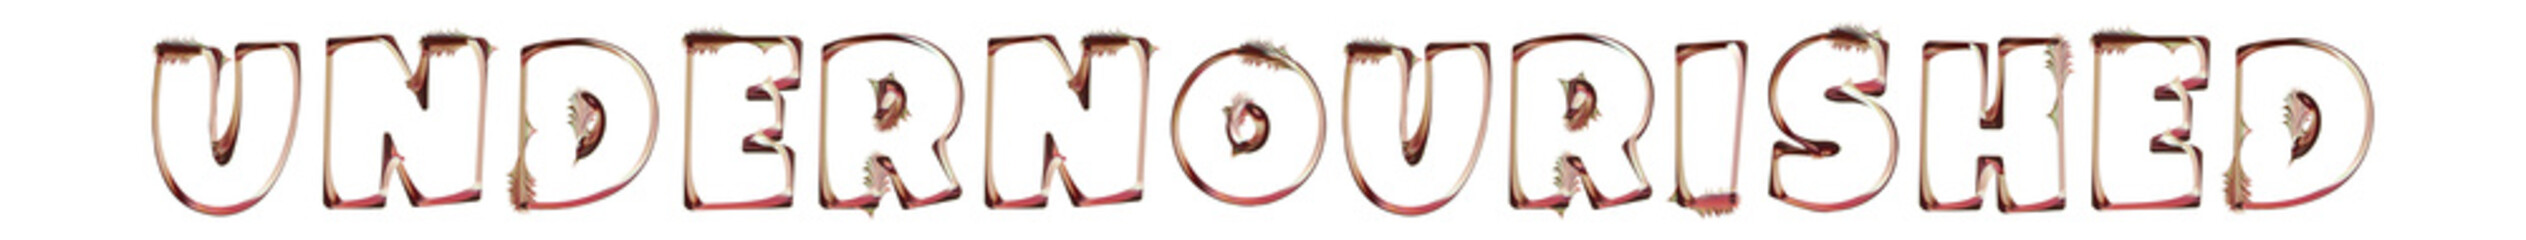 Undernourished - artistic text written on white background